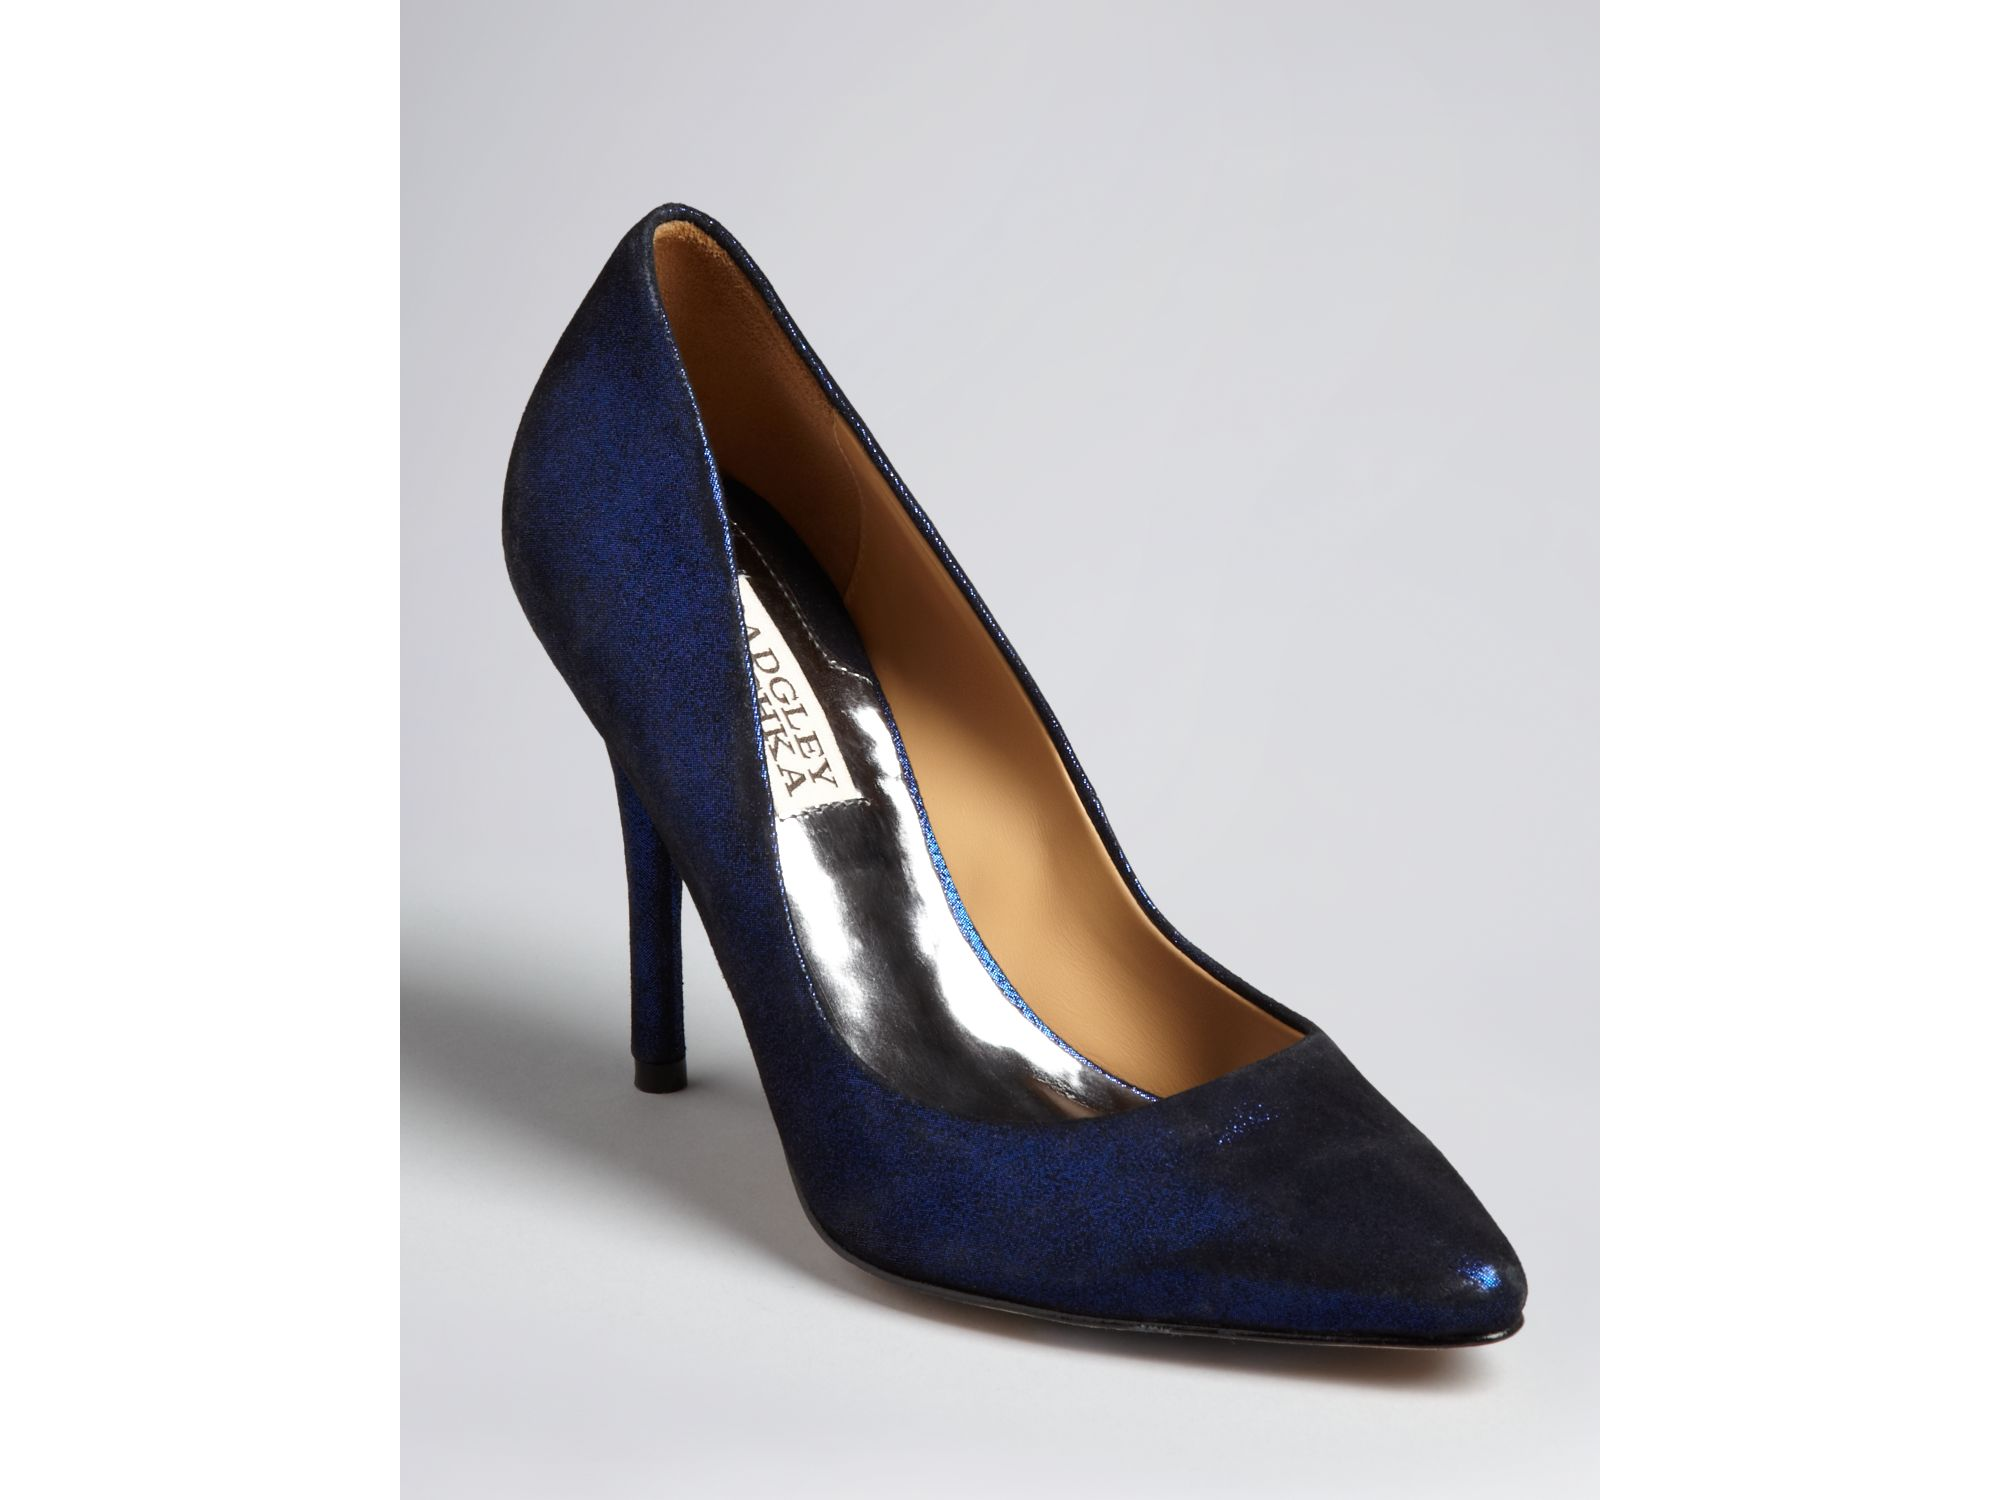 Electric Blue Pumps High Heels